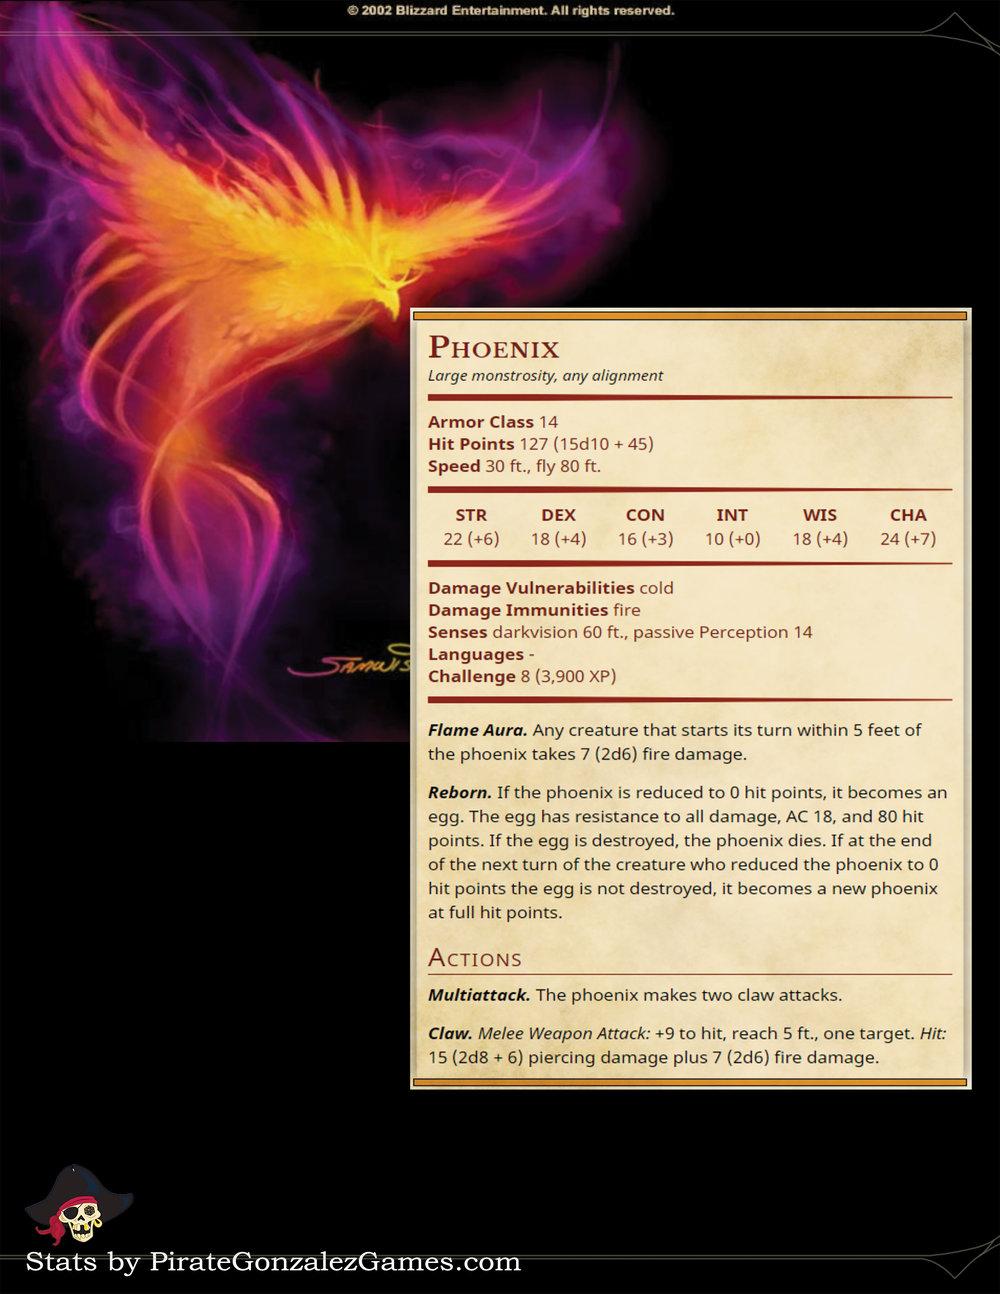 Warcraft III Phoenix